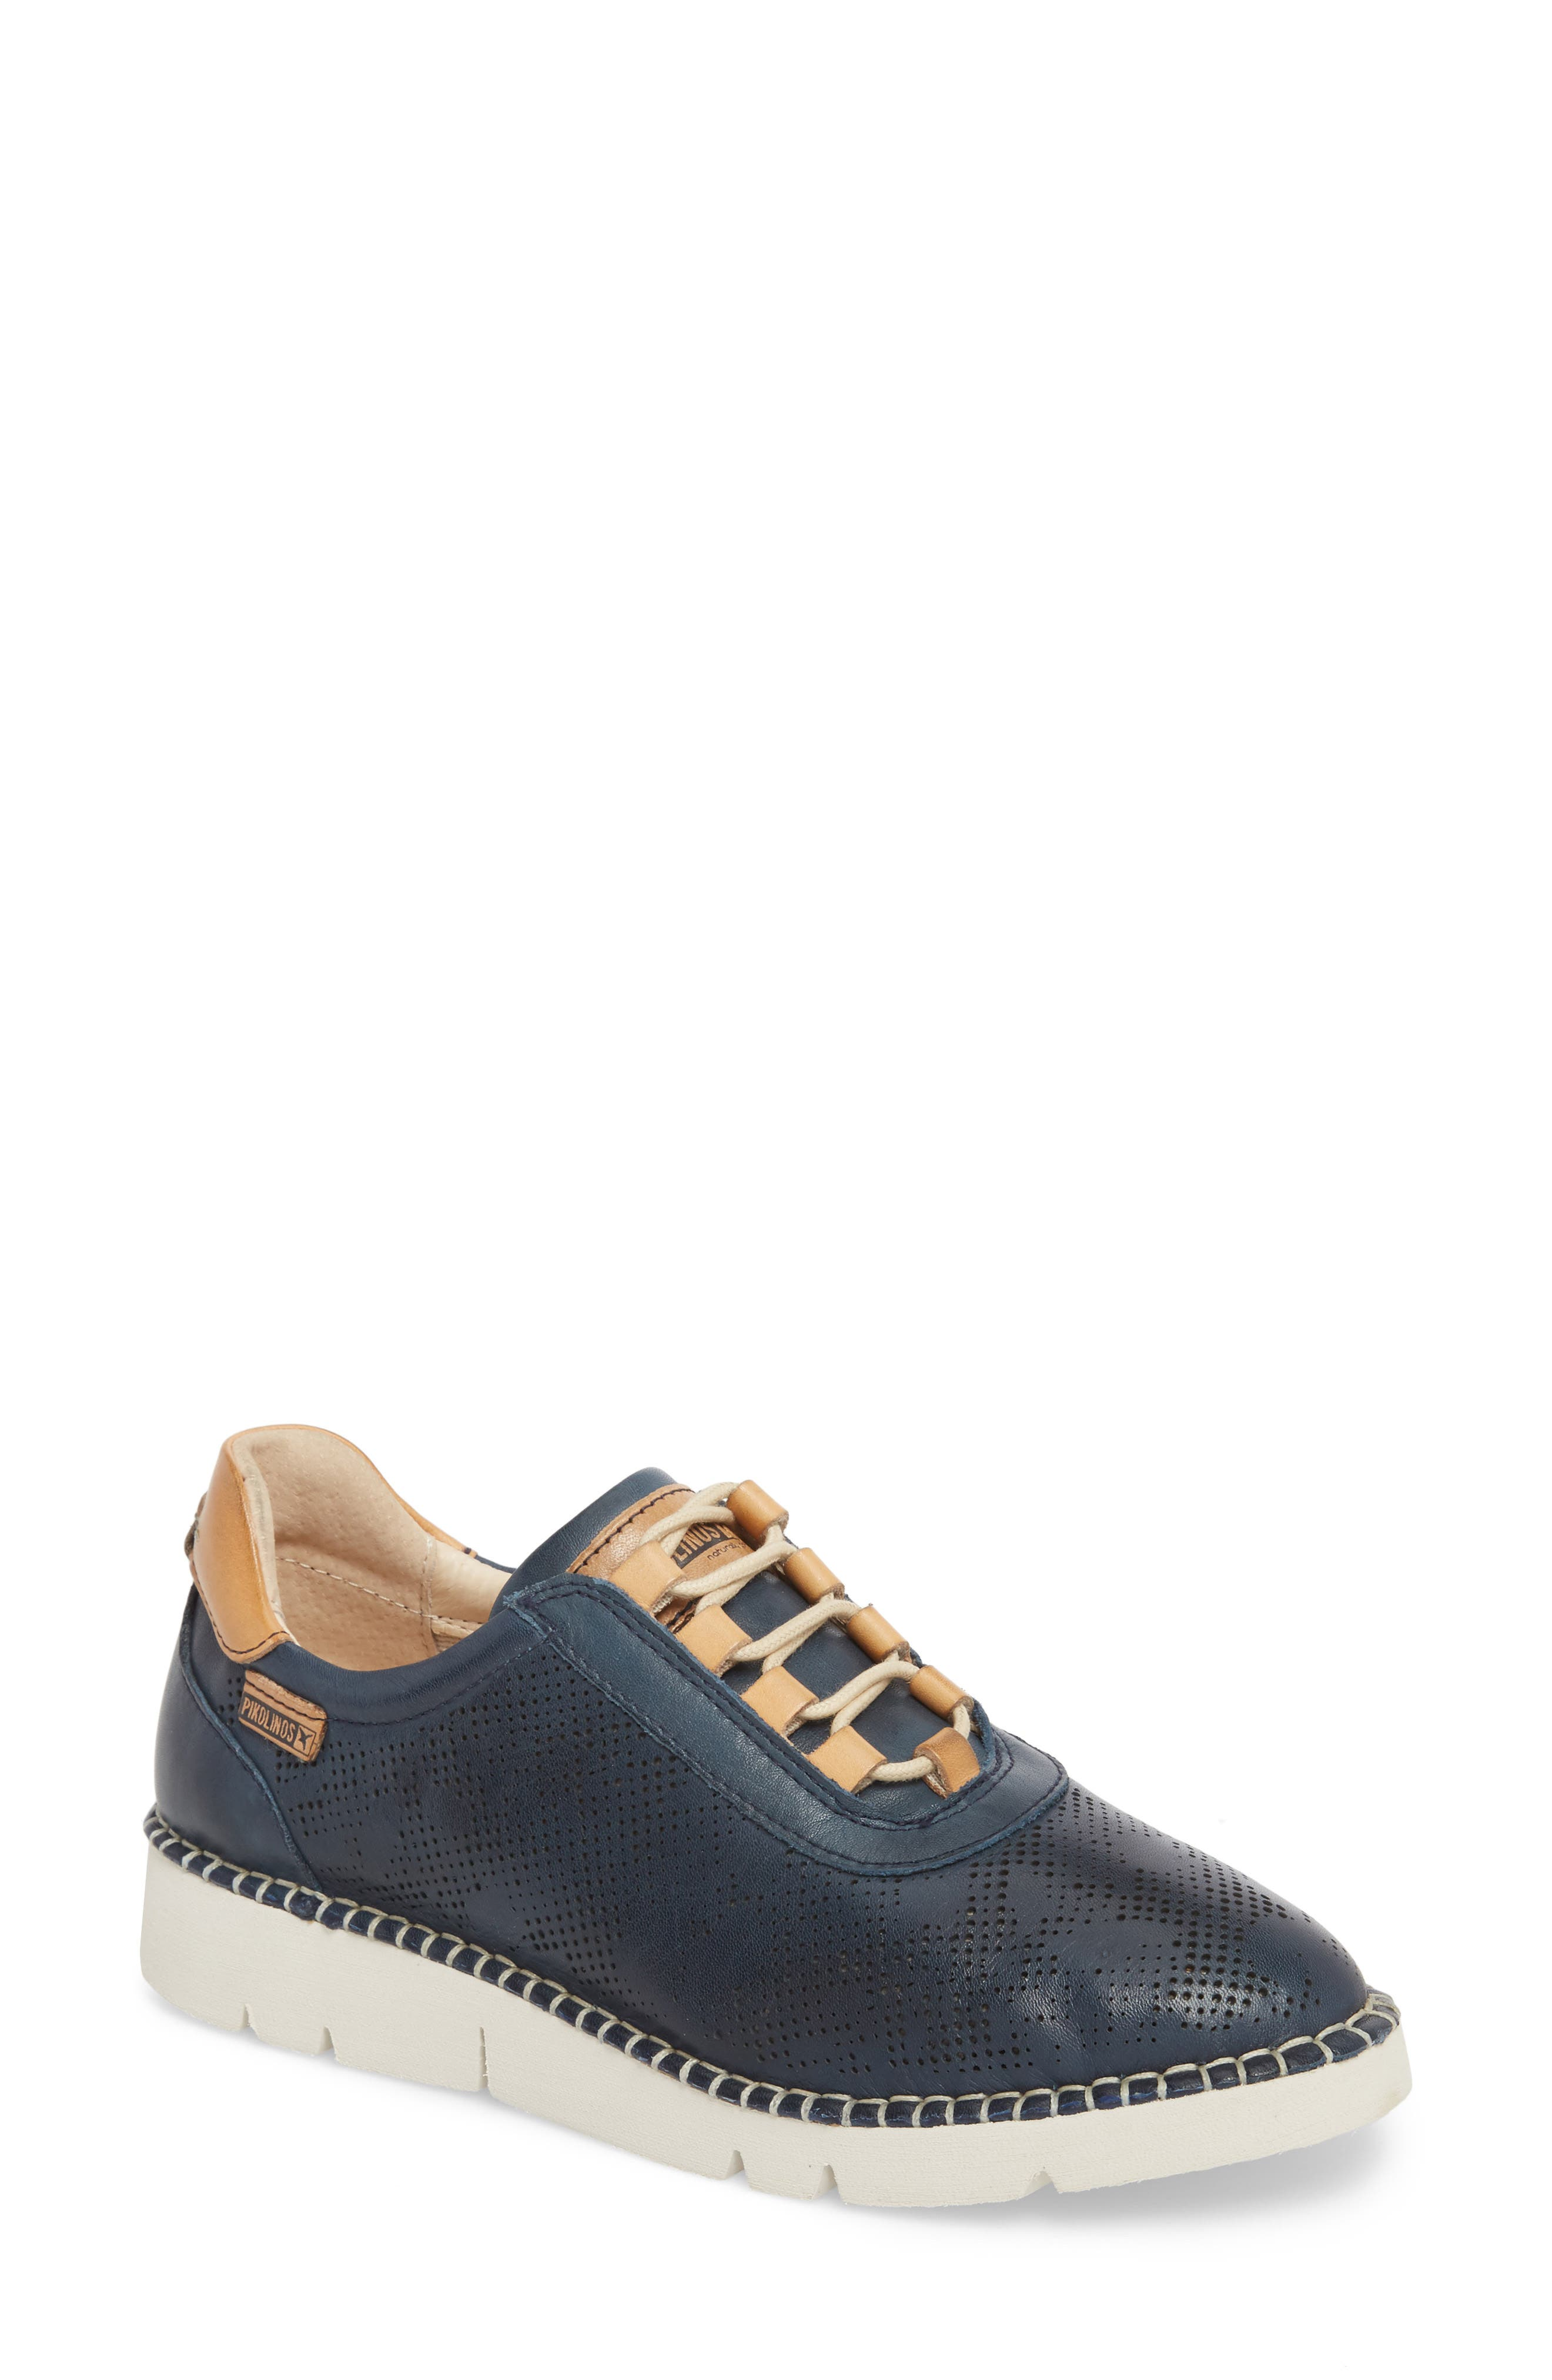 Vera Sneaker,                         Main,                         color, OCEAN LEATHER